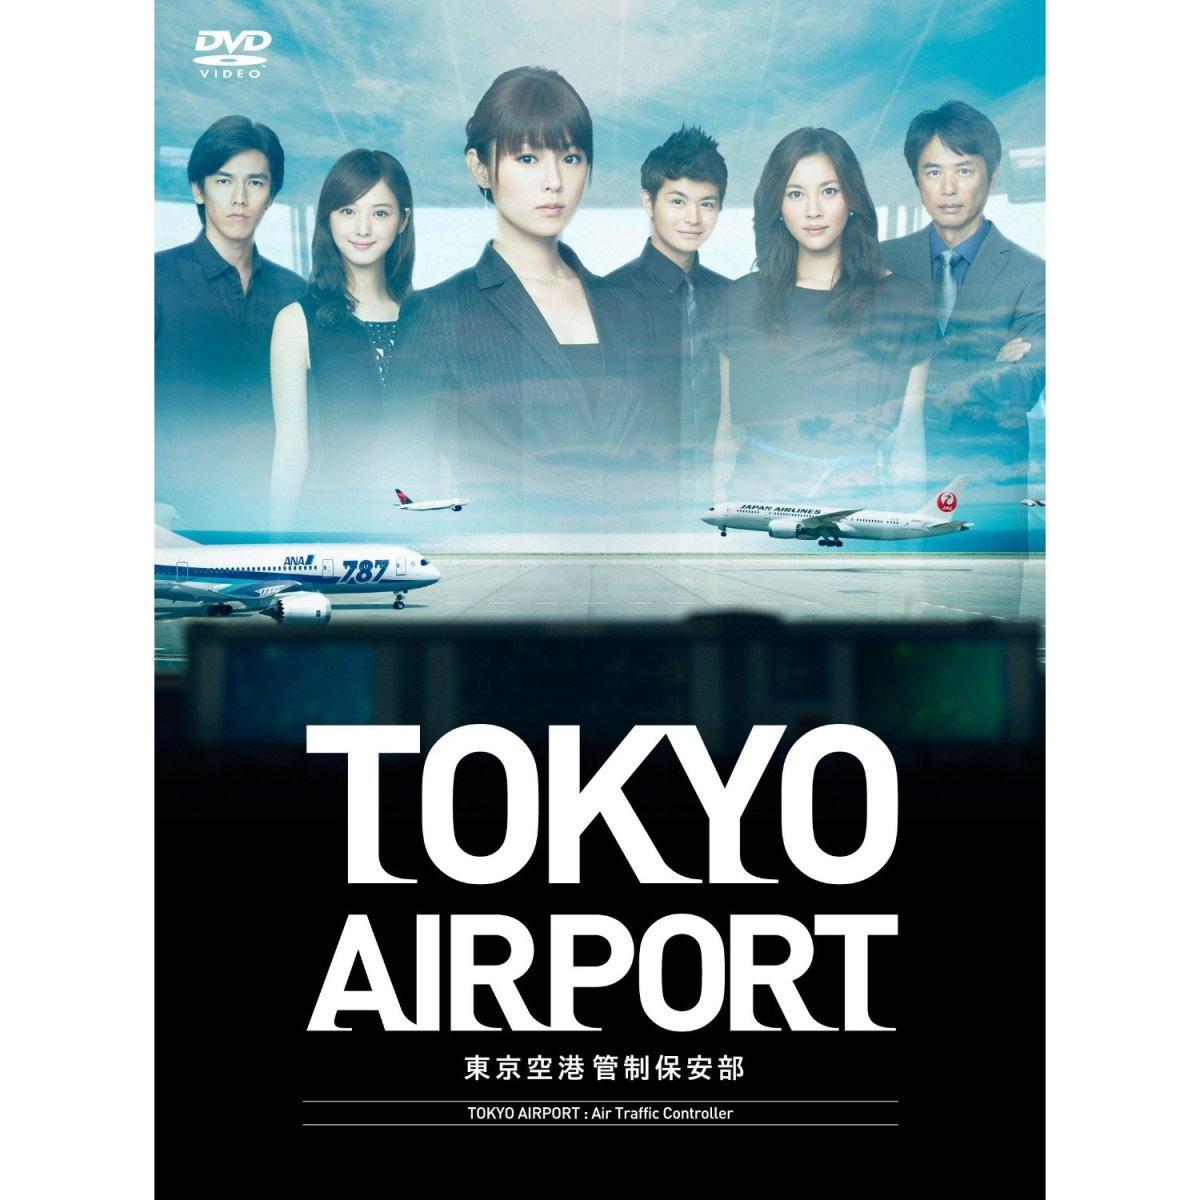 TOKYOエアポート〜東京空港管制保安部〜 DVD-BOX画像